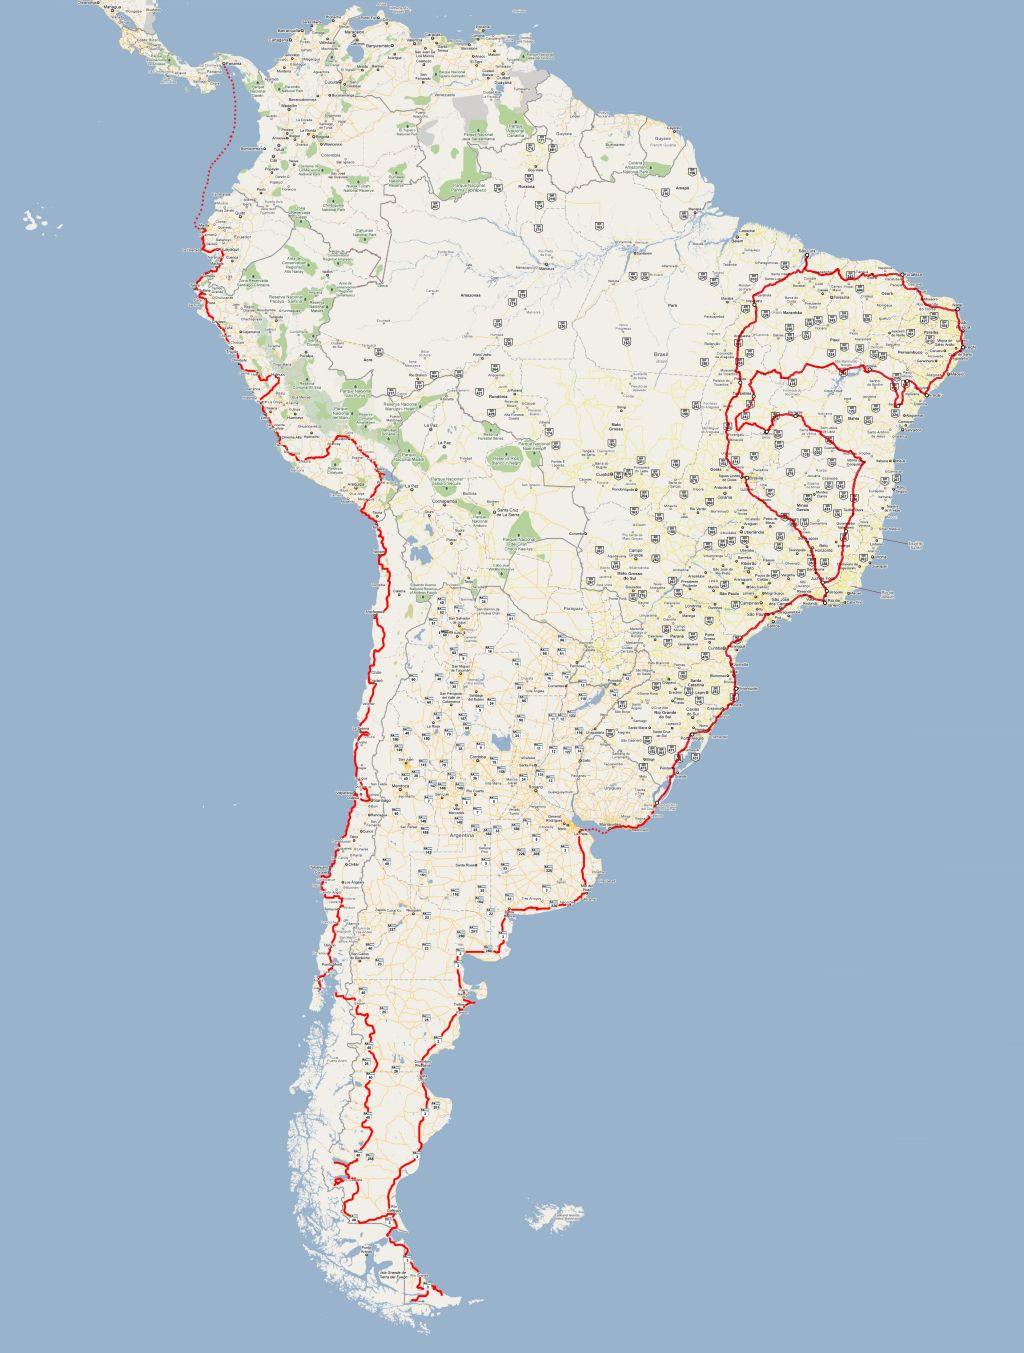 Map 3 - South America